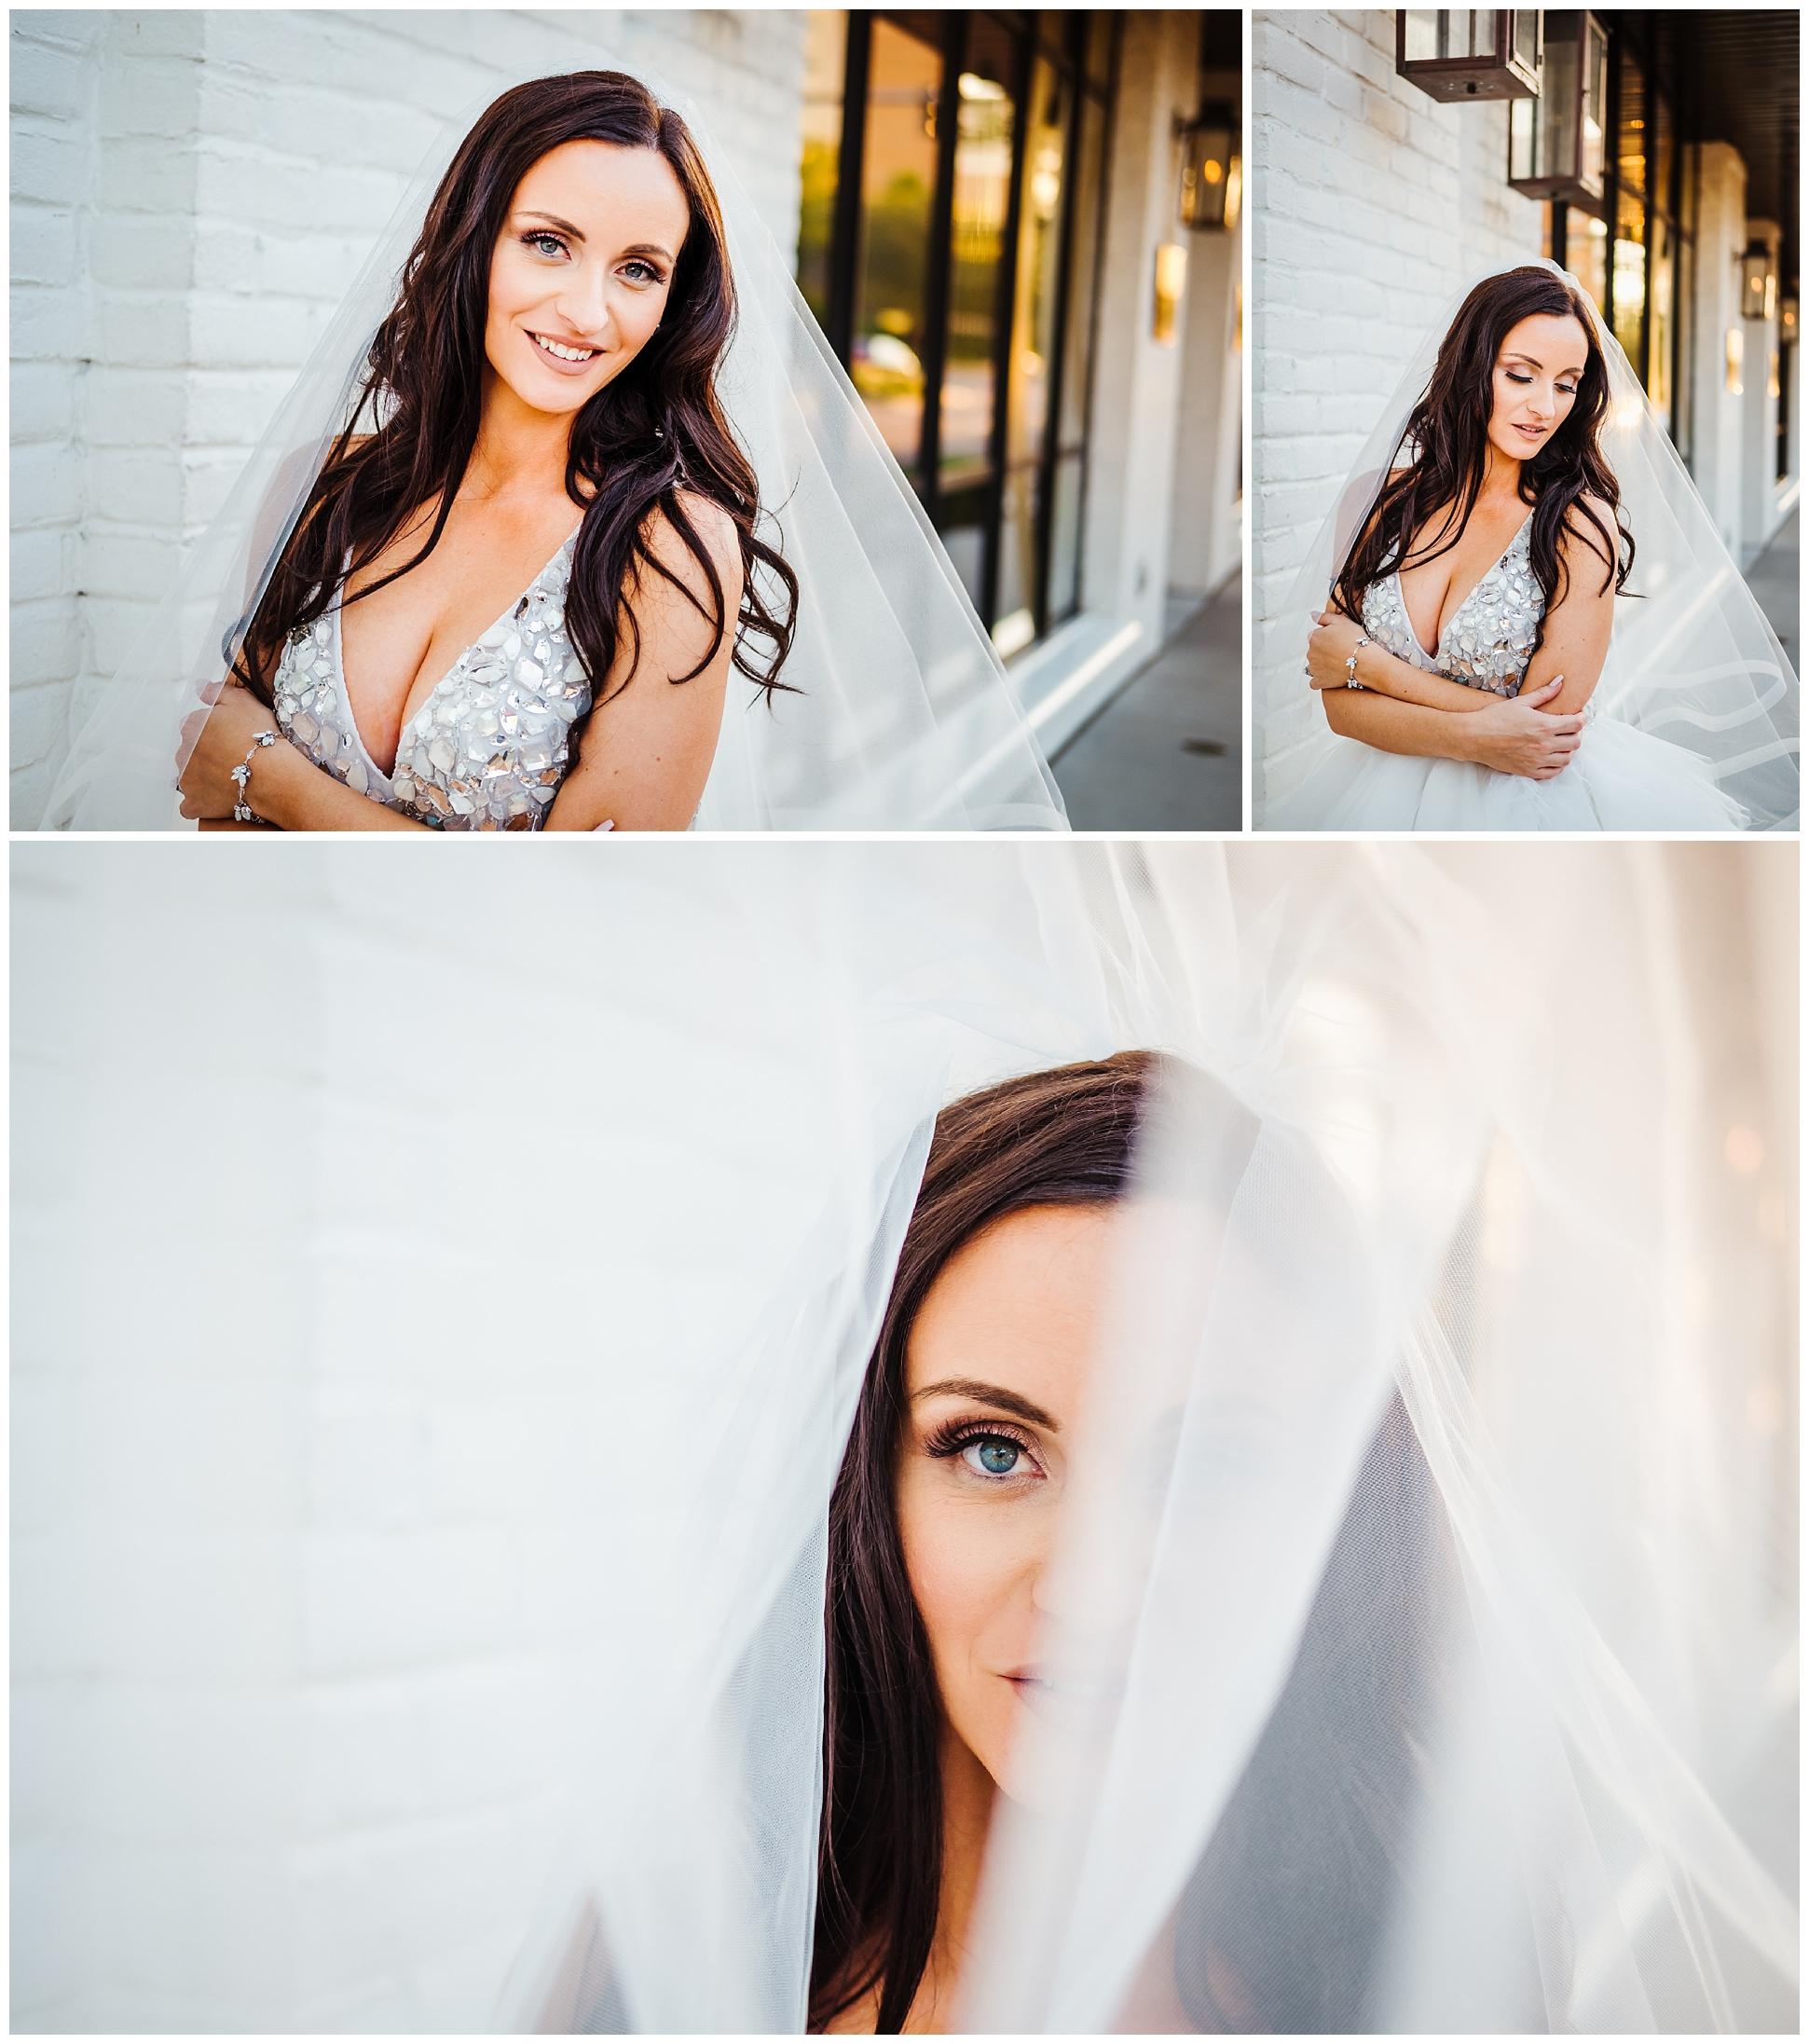 tampa-wedding-photographer-oxford-exchange-garland-candlelight-gold-hayley-paige_0032.jpg